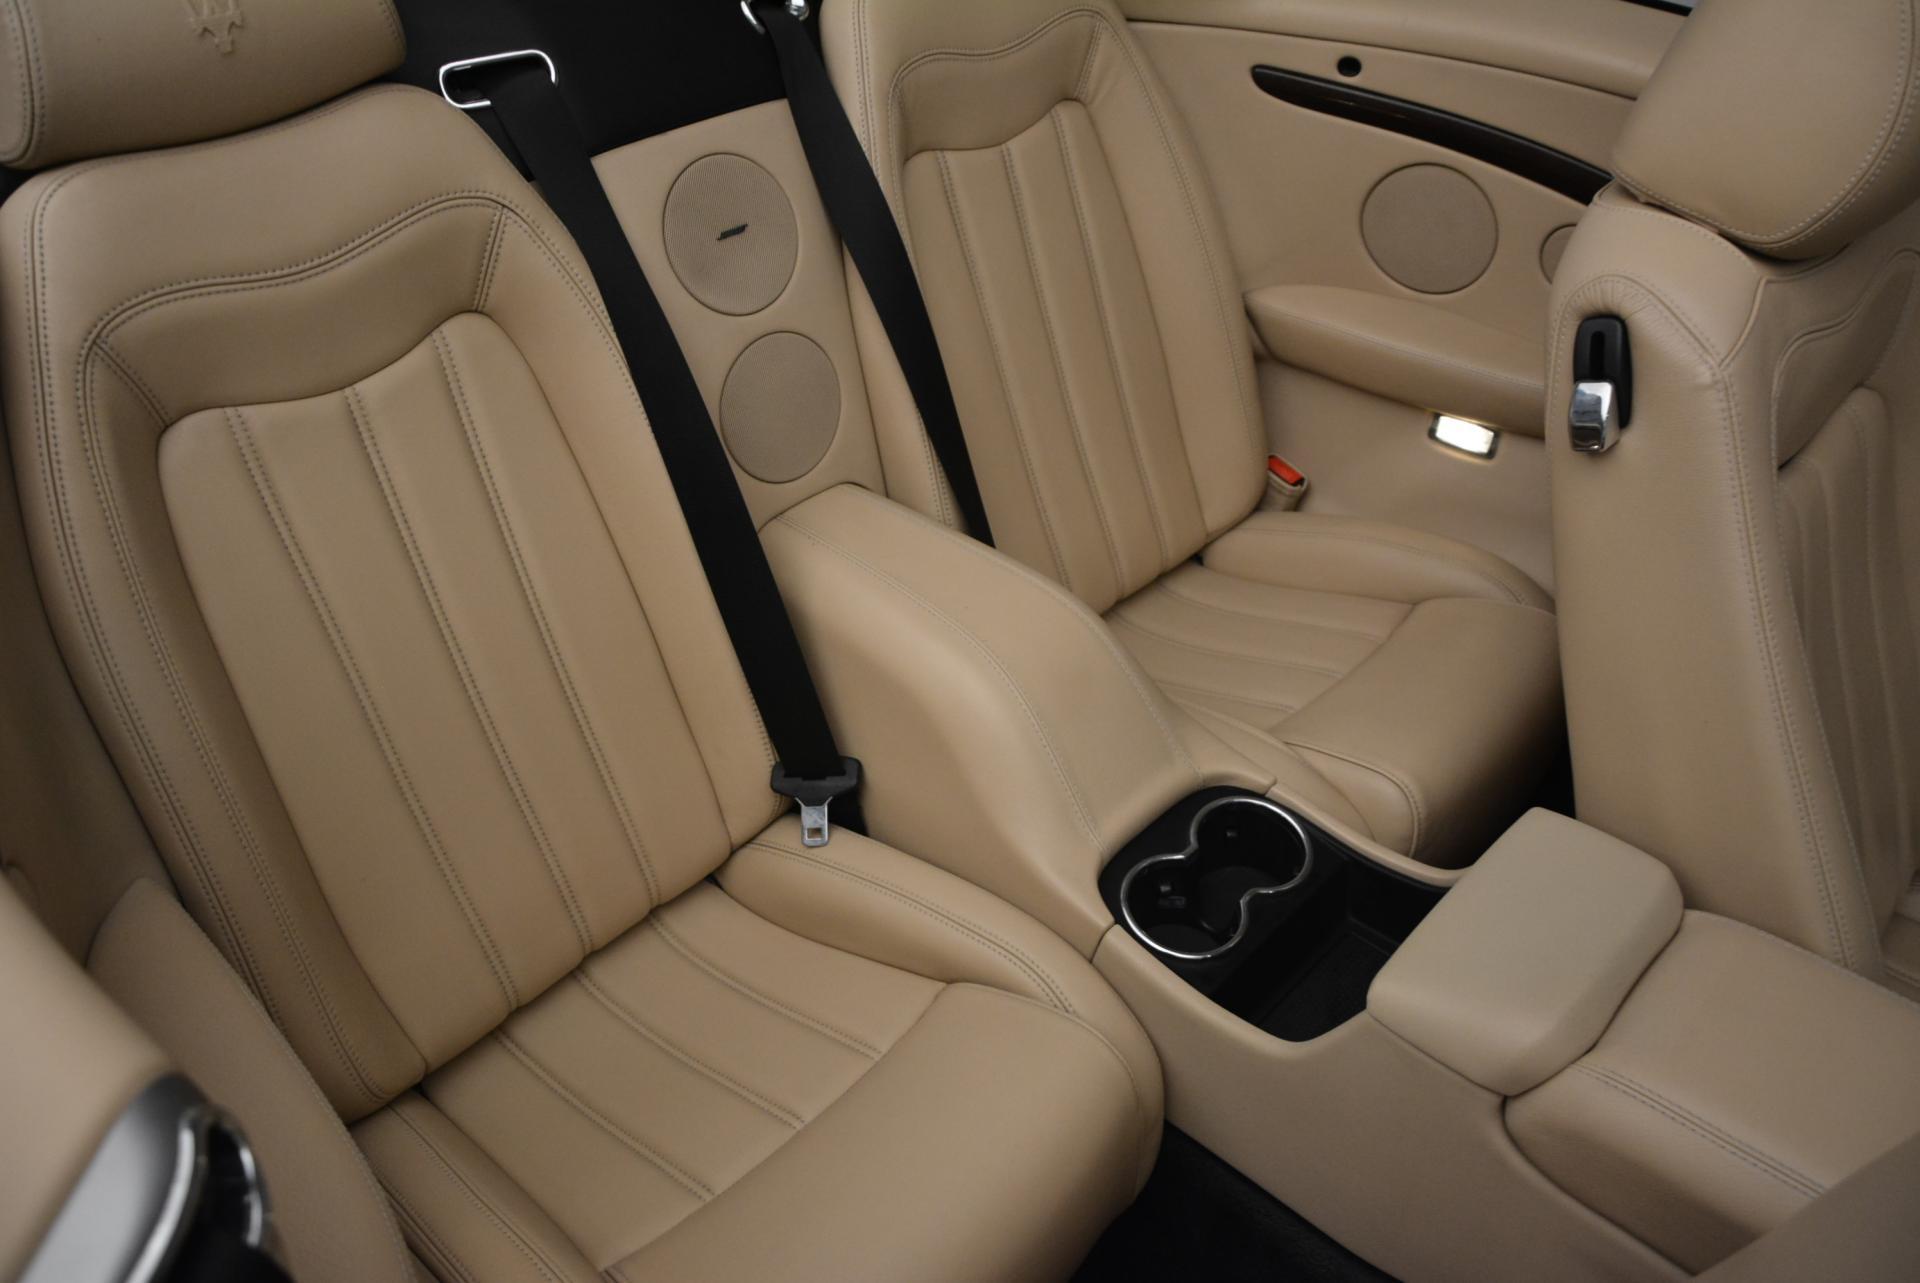 Used 2011 Maserati GranTurismo Base For Sale In Westport, CT 158_p34